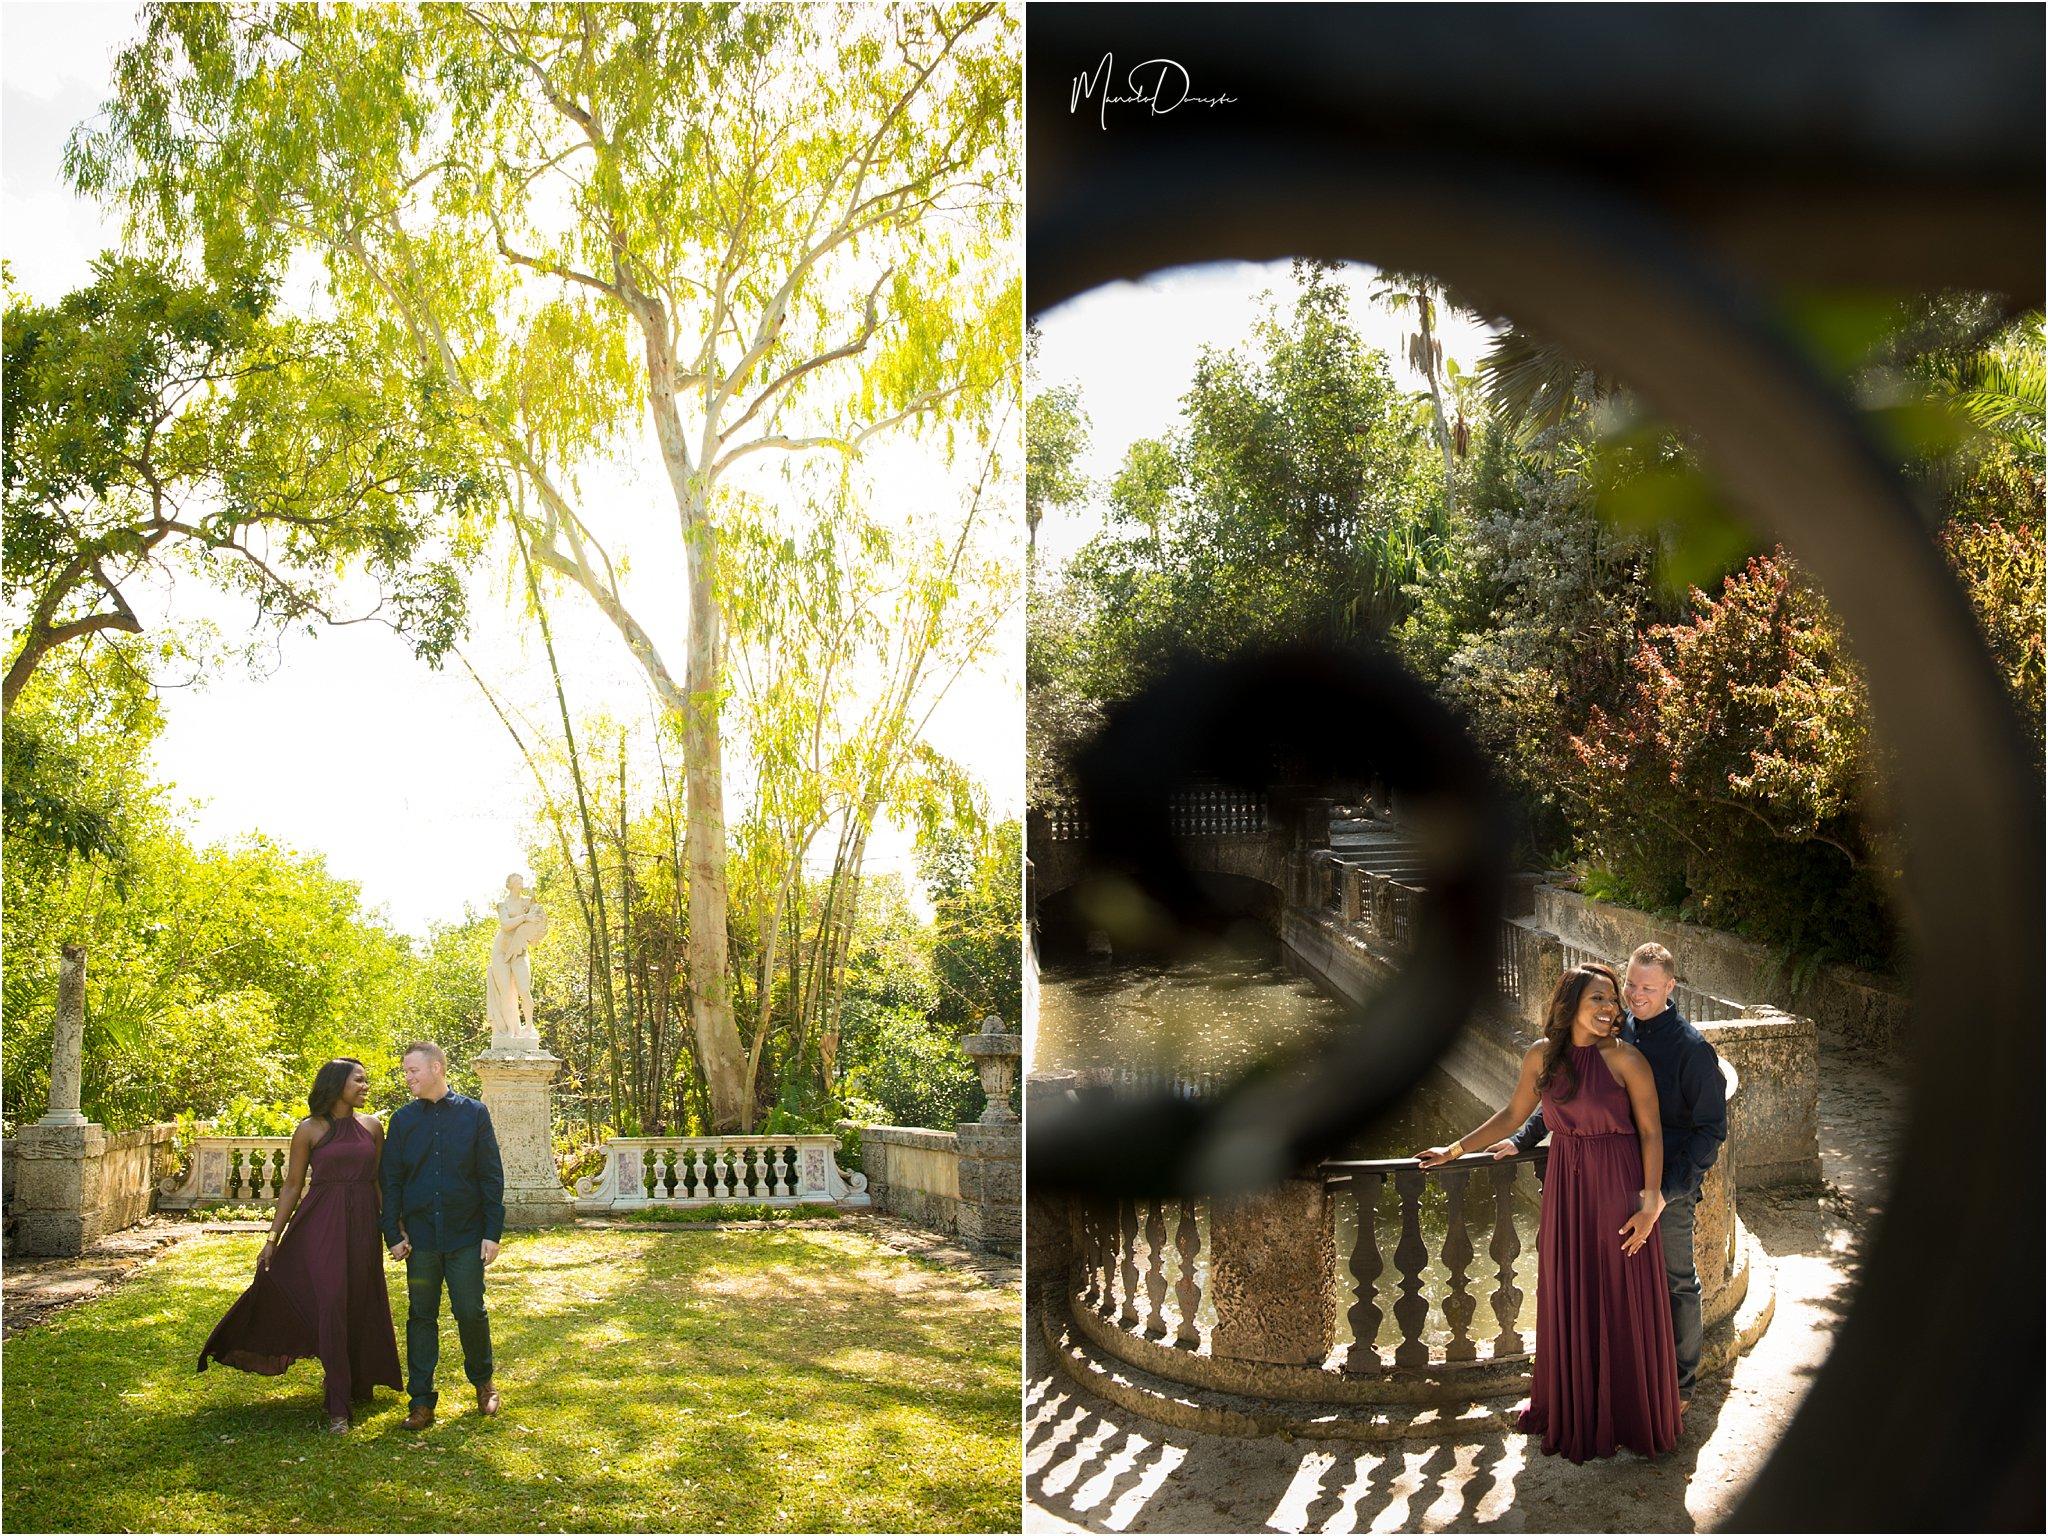 0691_ManoloDoreste_InFocusStudios_Wedding_Family_Photography_Miami_MiamiPhotographer.jpg